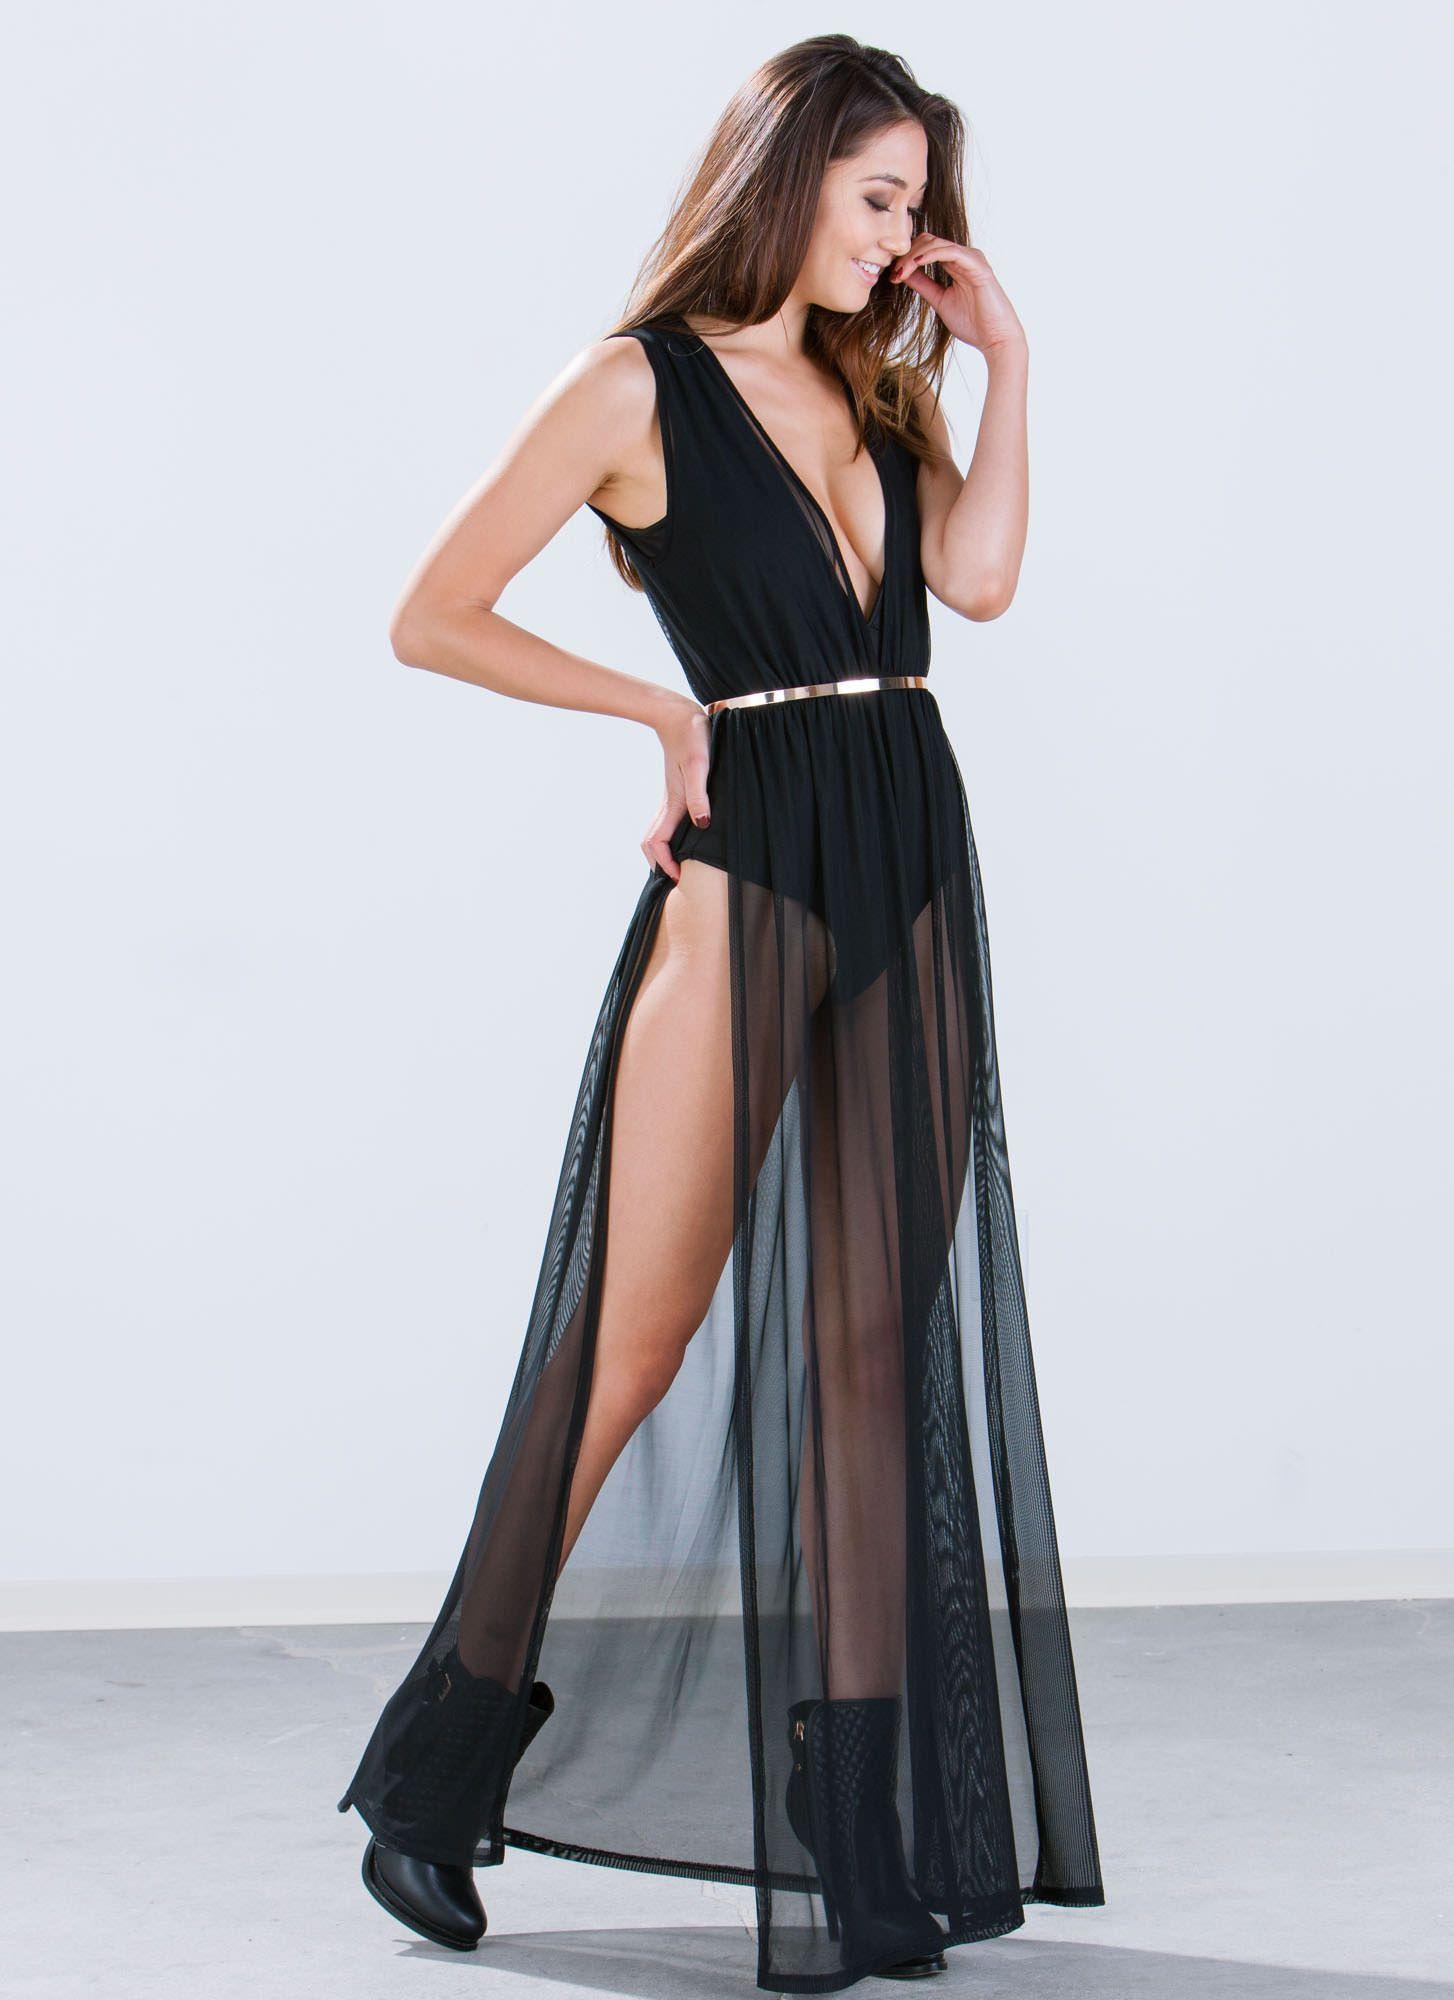 Multitask Bodysuit Mesh Maxi Dress Black Nude Ivory Gojane